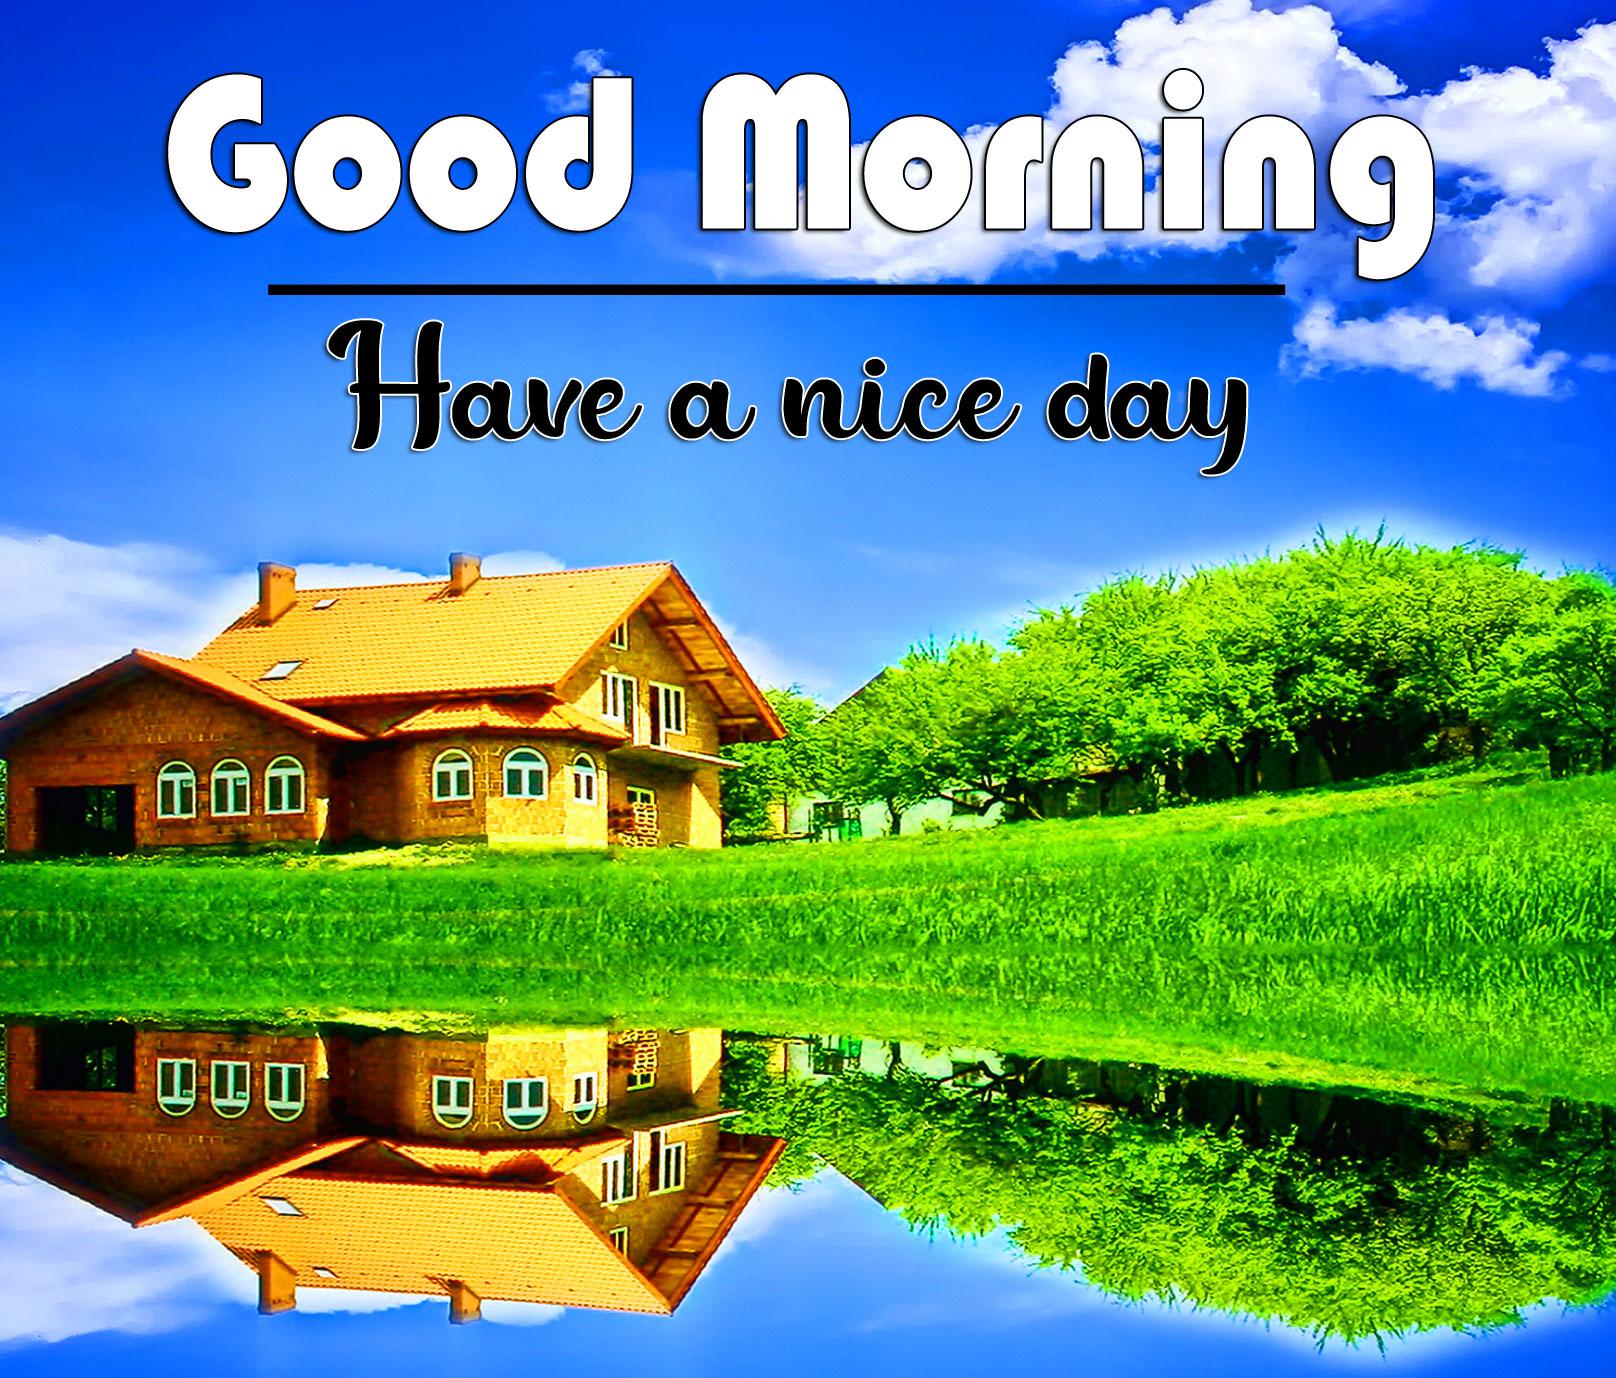 Free Nature HD good morning Whatsapp dp Images